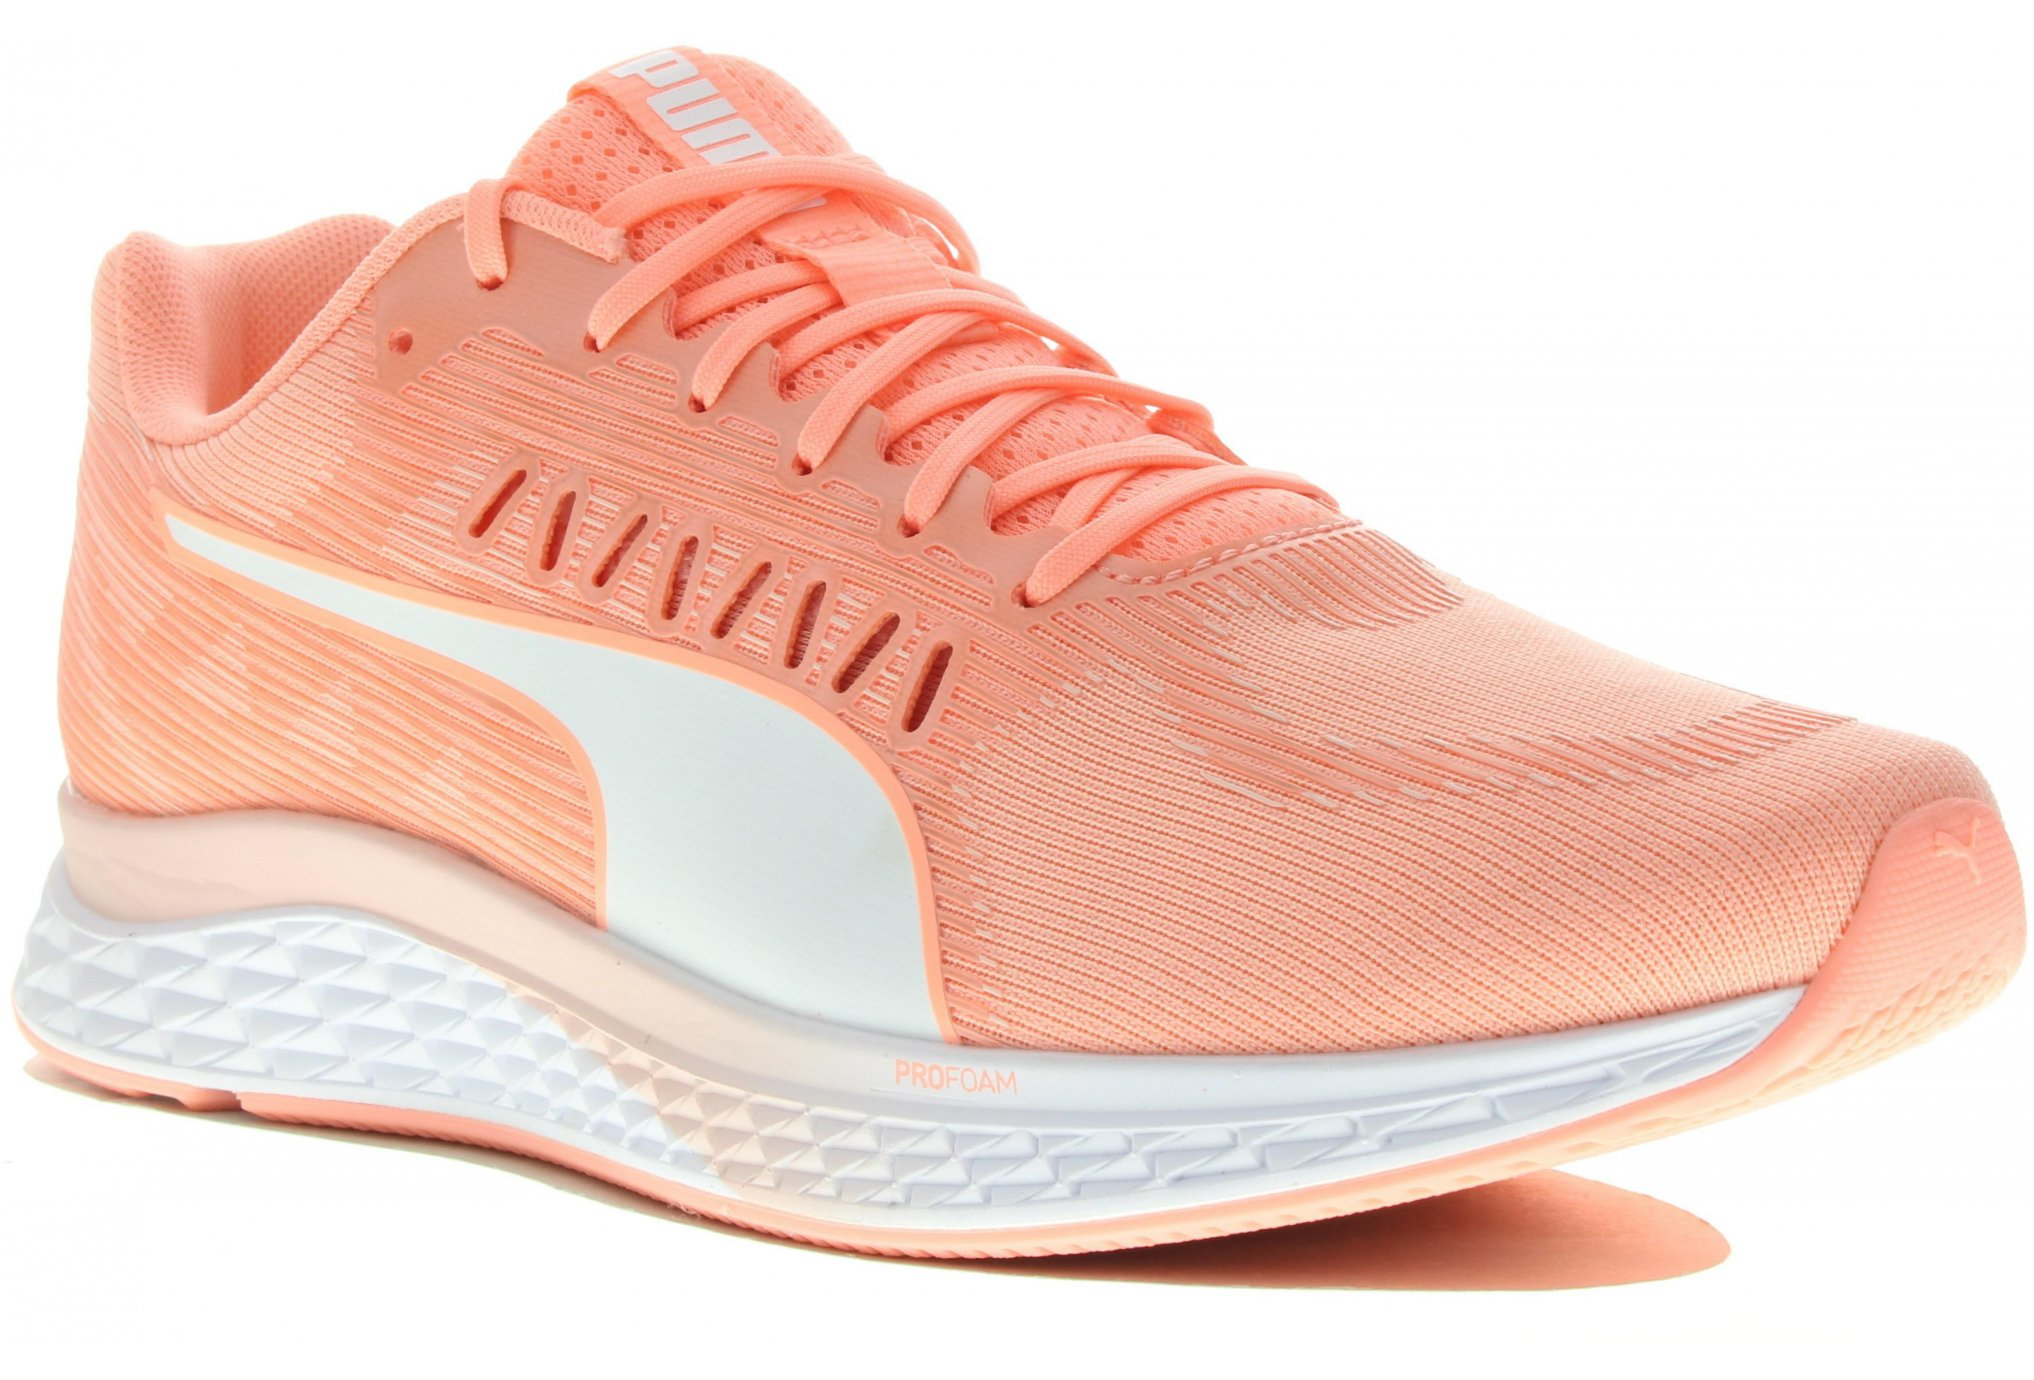 1d3cf50d2040 Outlet de zapatillas de running Puma talla 38 baratas - Ofertas para ...